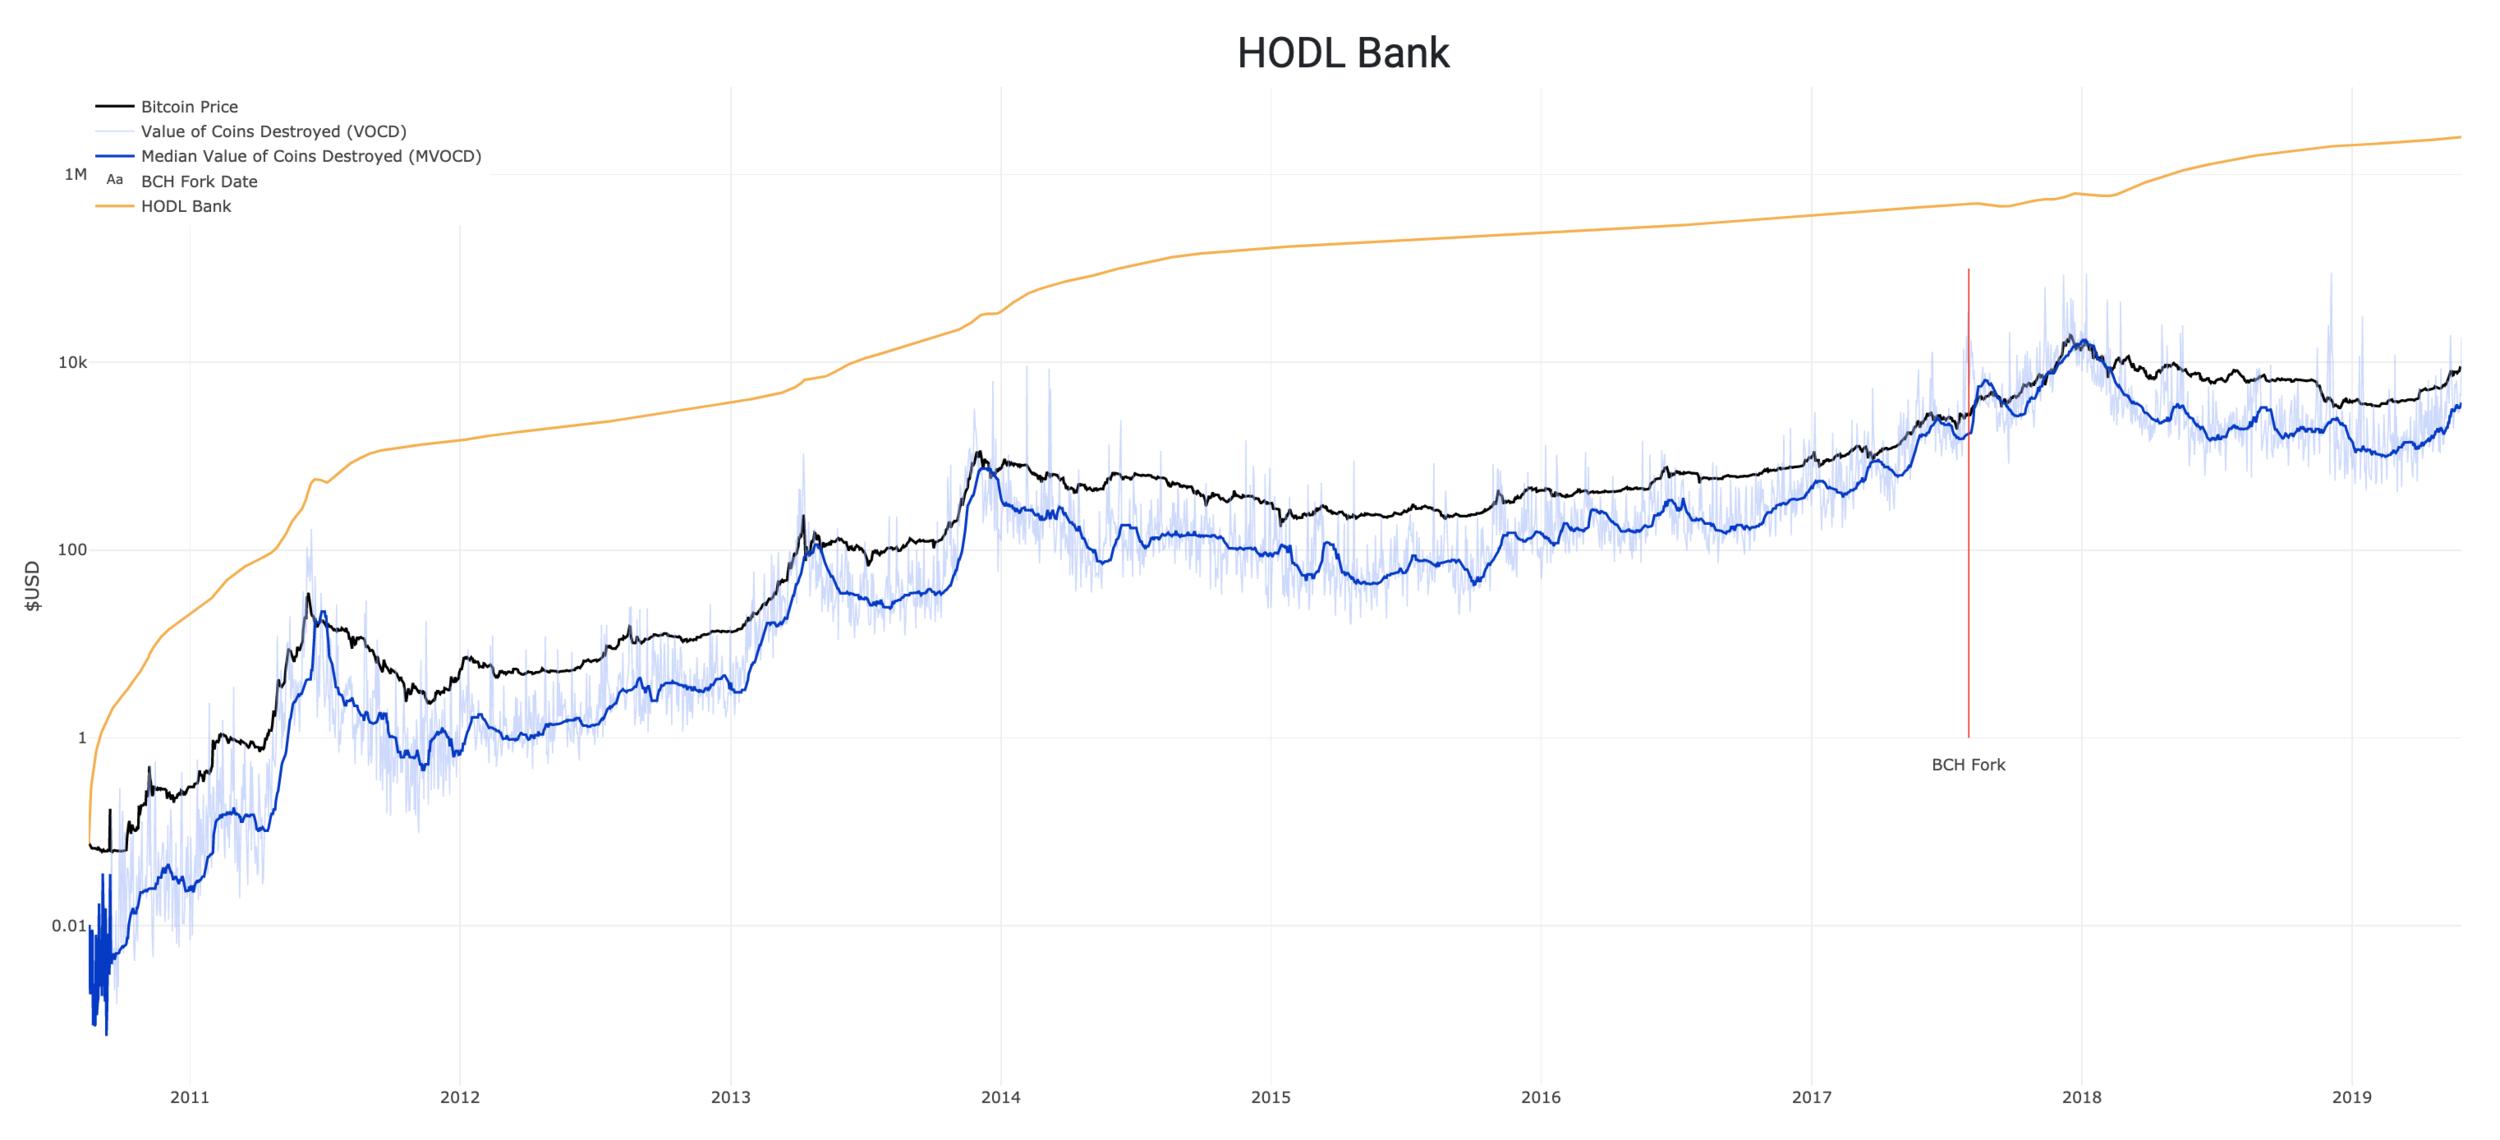 Source Data: Blockchair.com, Blockchain.com